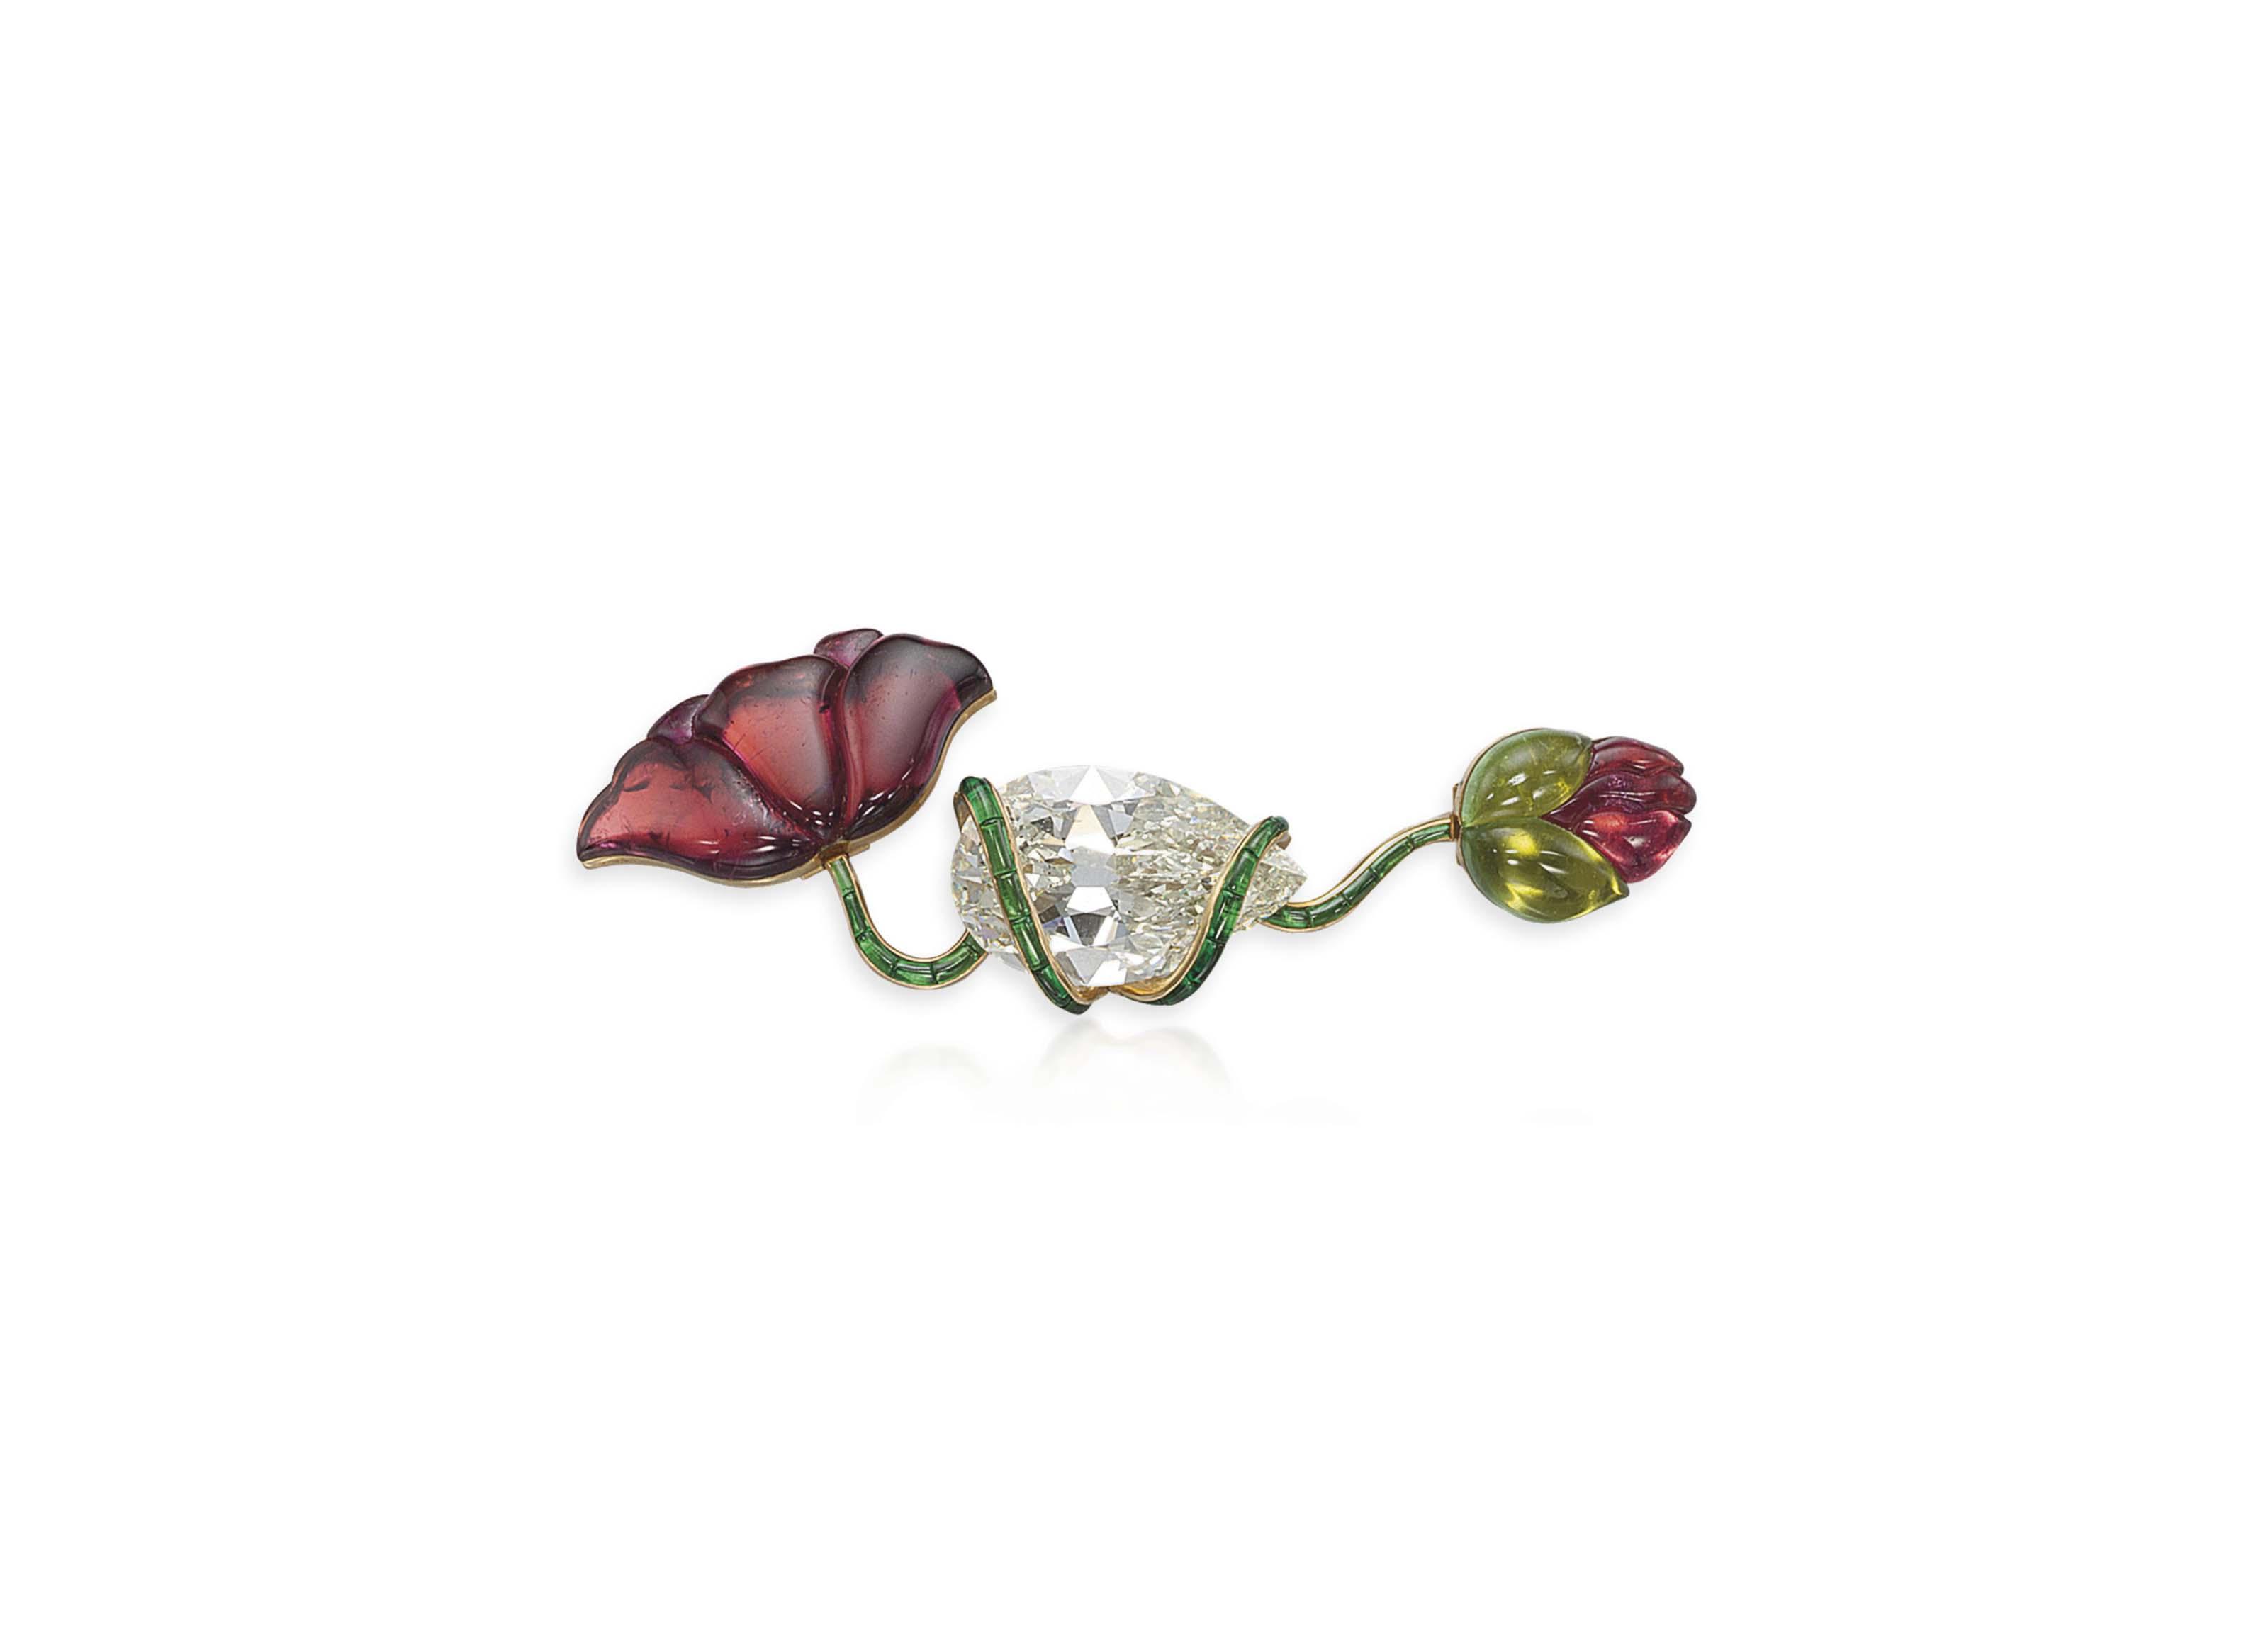 A TOURMALINE AND DIAMOND FLOWER BROOCH, BY JAR